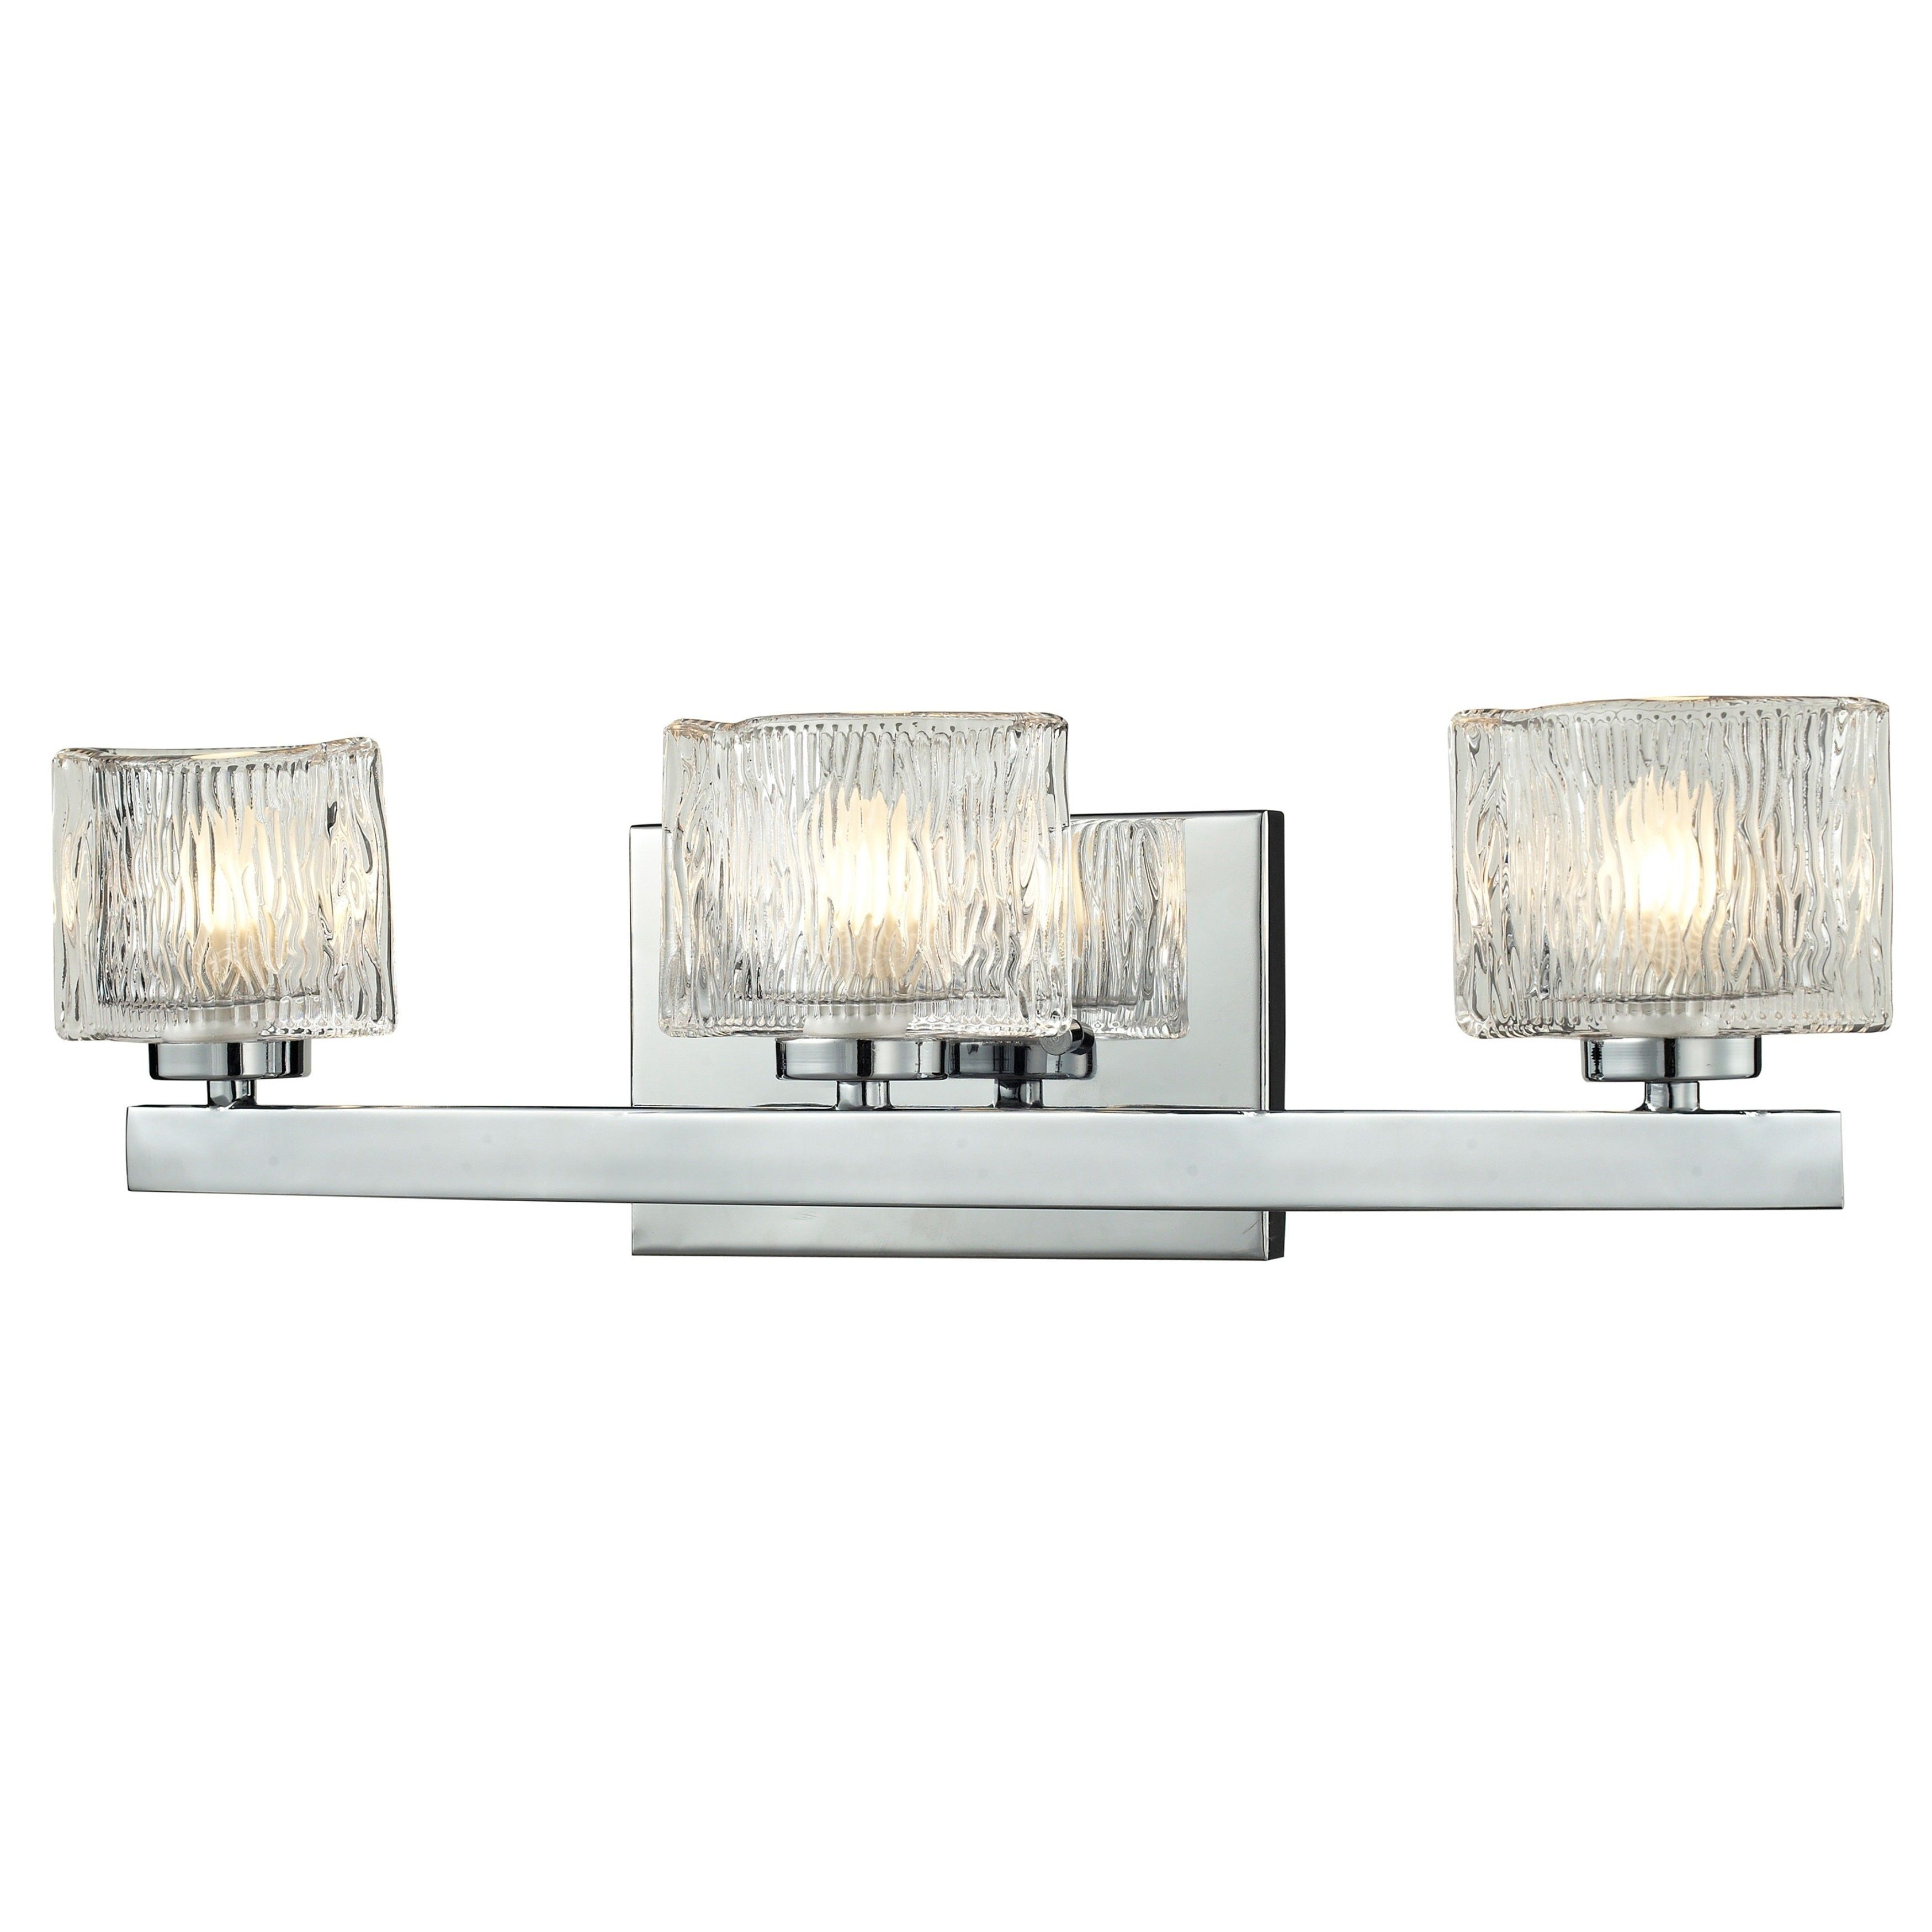 Z-Lite 3 Light Vanity Silver Finish (Silver Finish) (Steel)